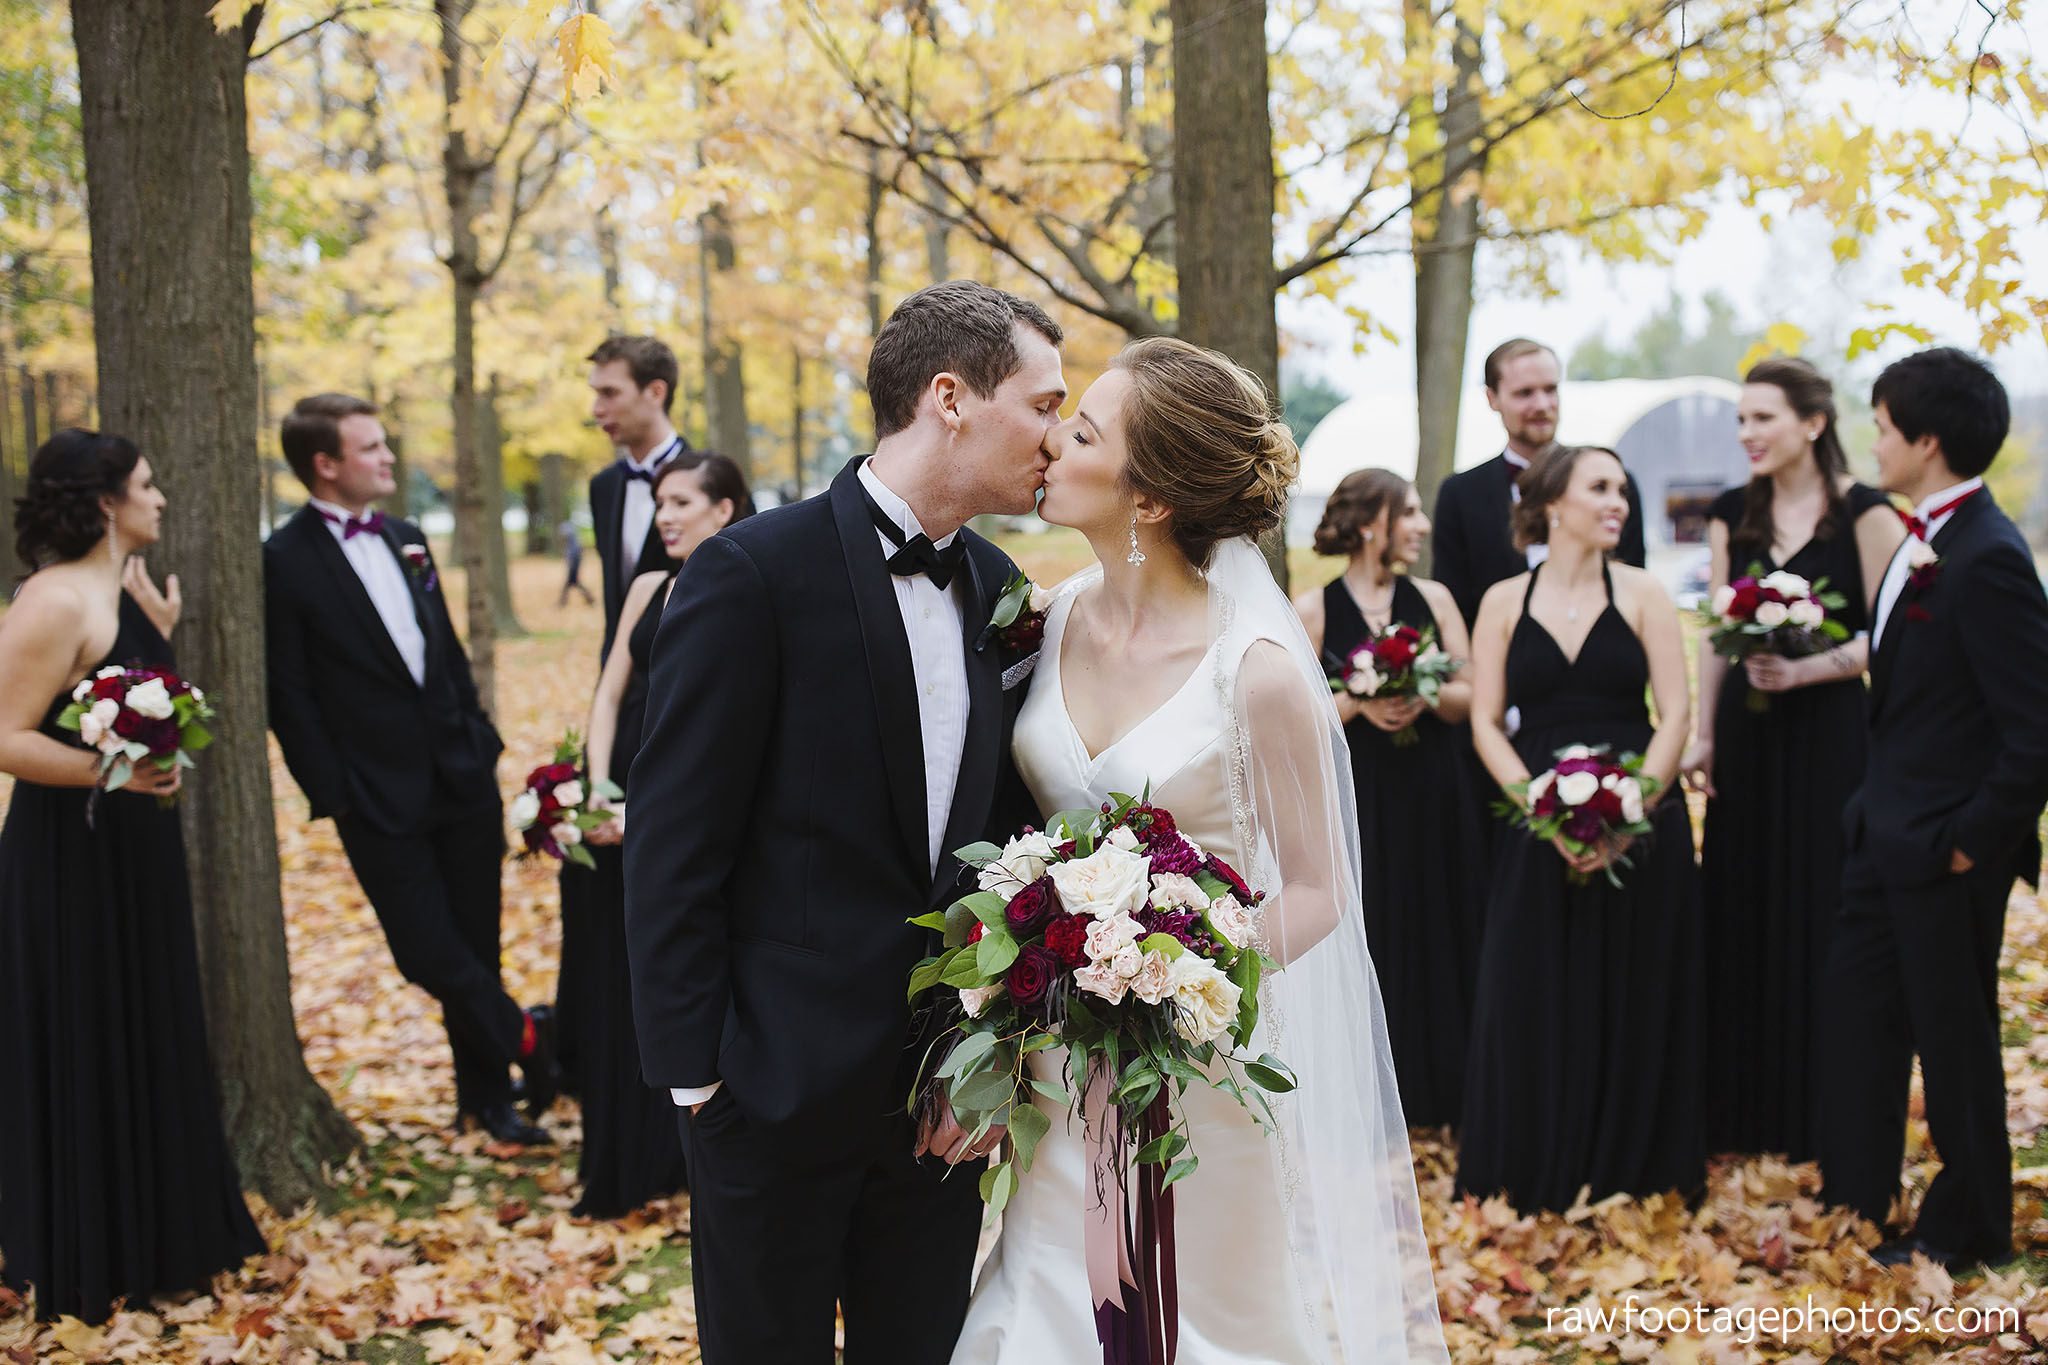 london_ontario_wedding_photos-fall_wedding_photography-raw_footage_photography-elm_hurst_inn_wedding025.jpg